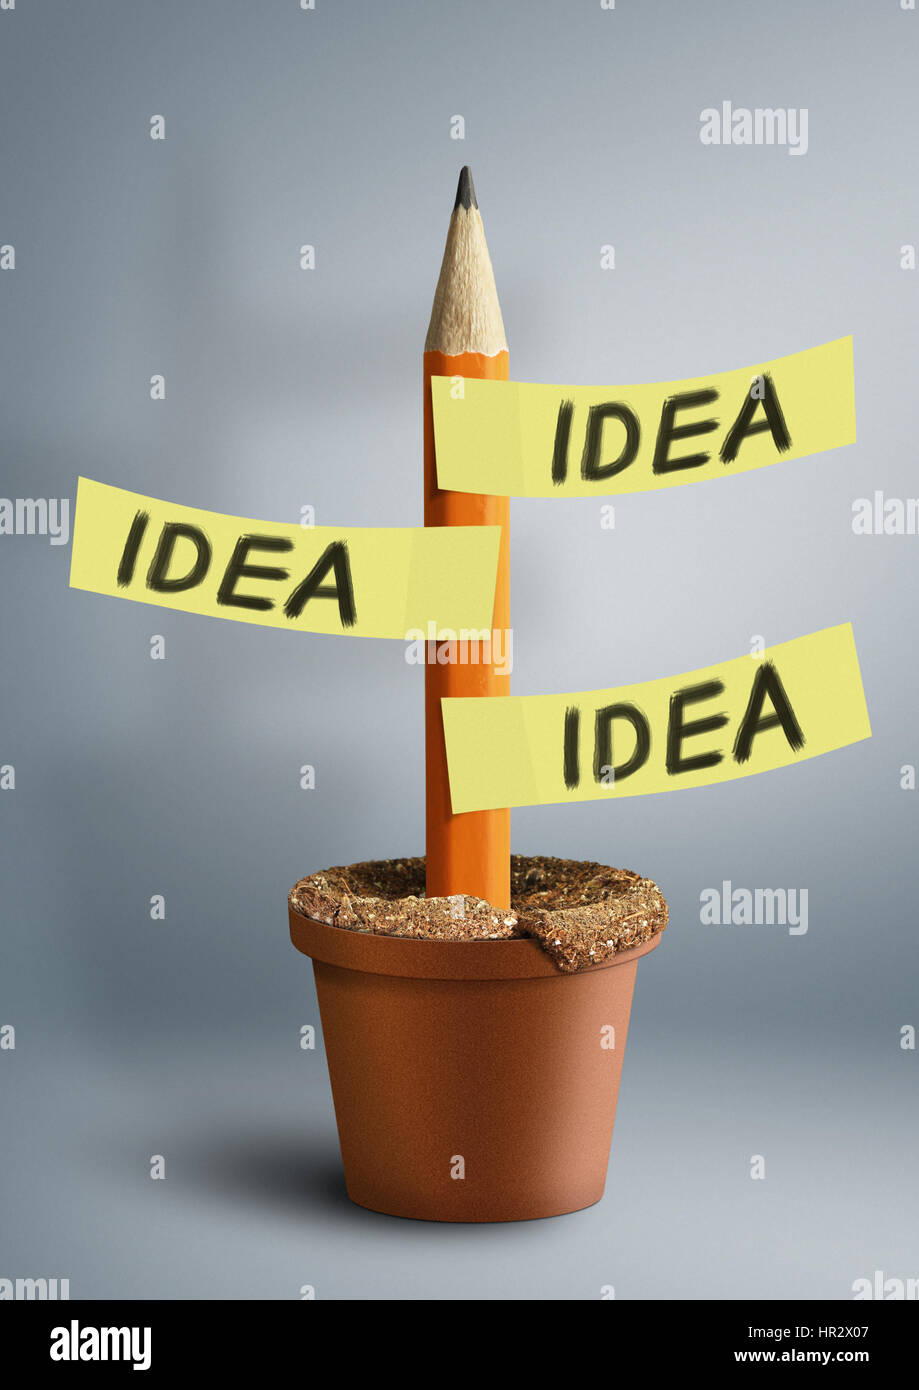 Idea creative concept, pencil with stickers - Stock Image